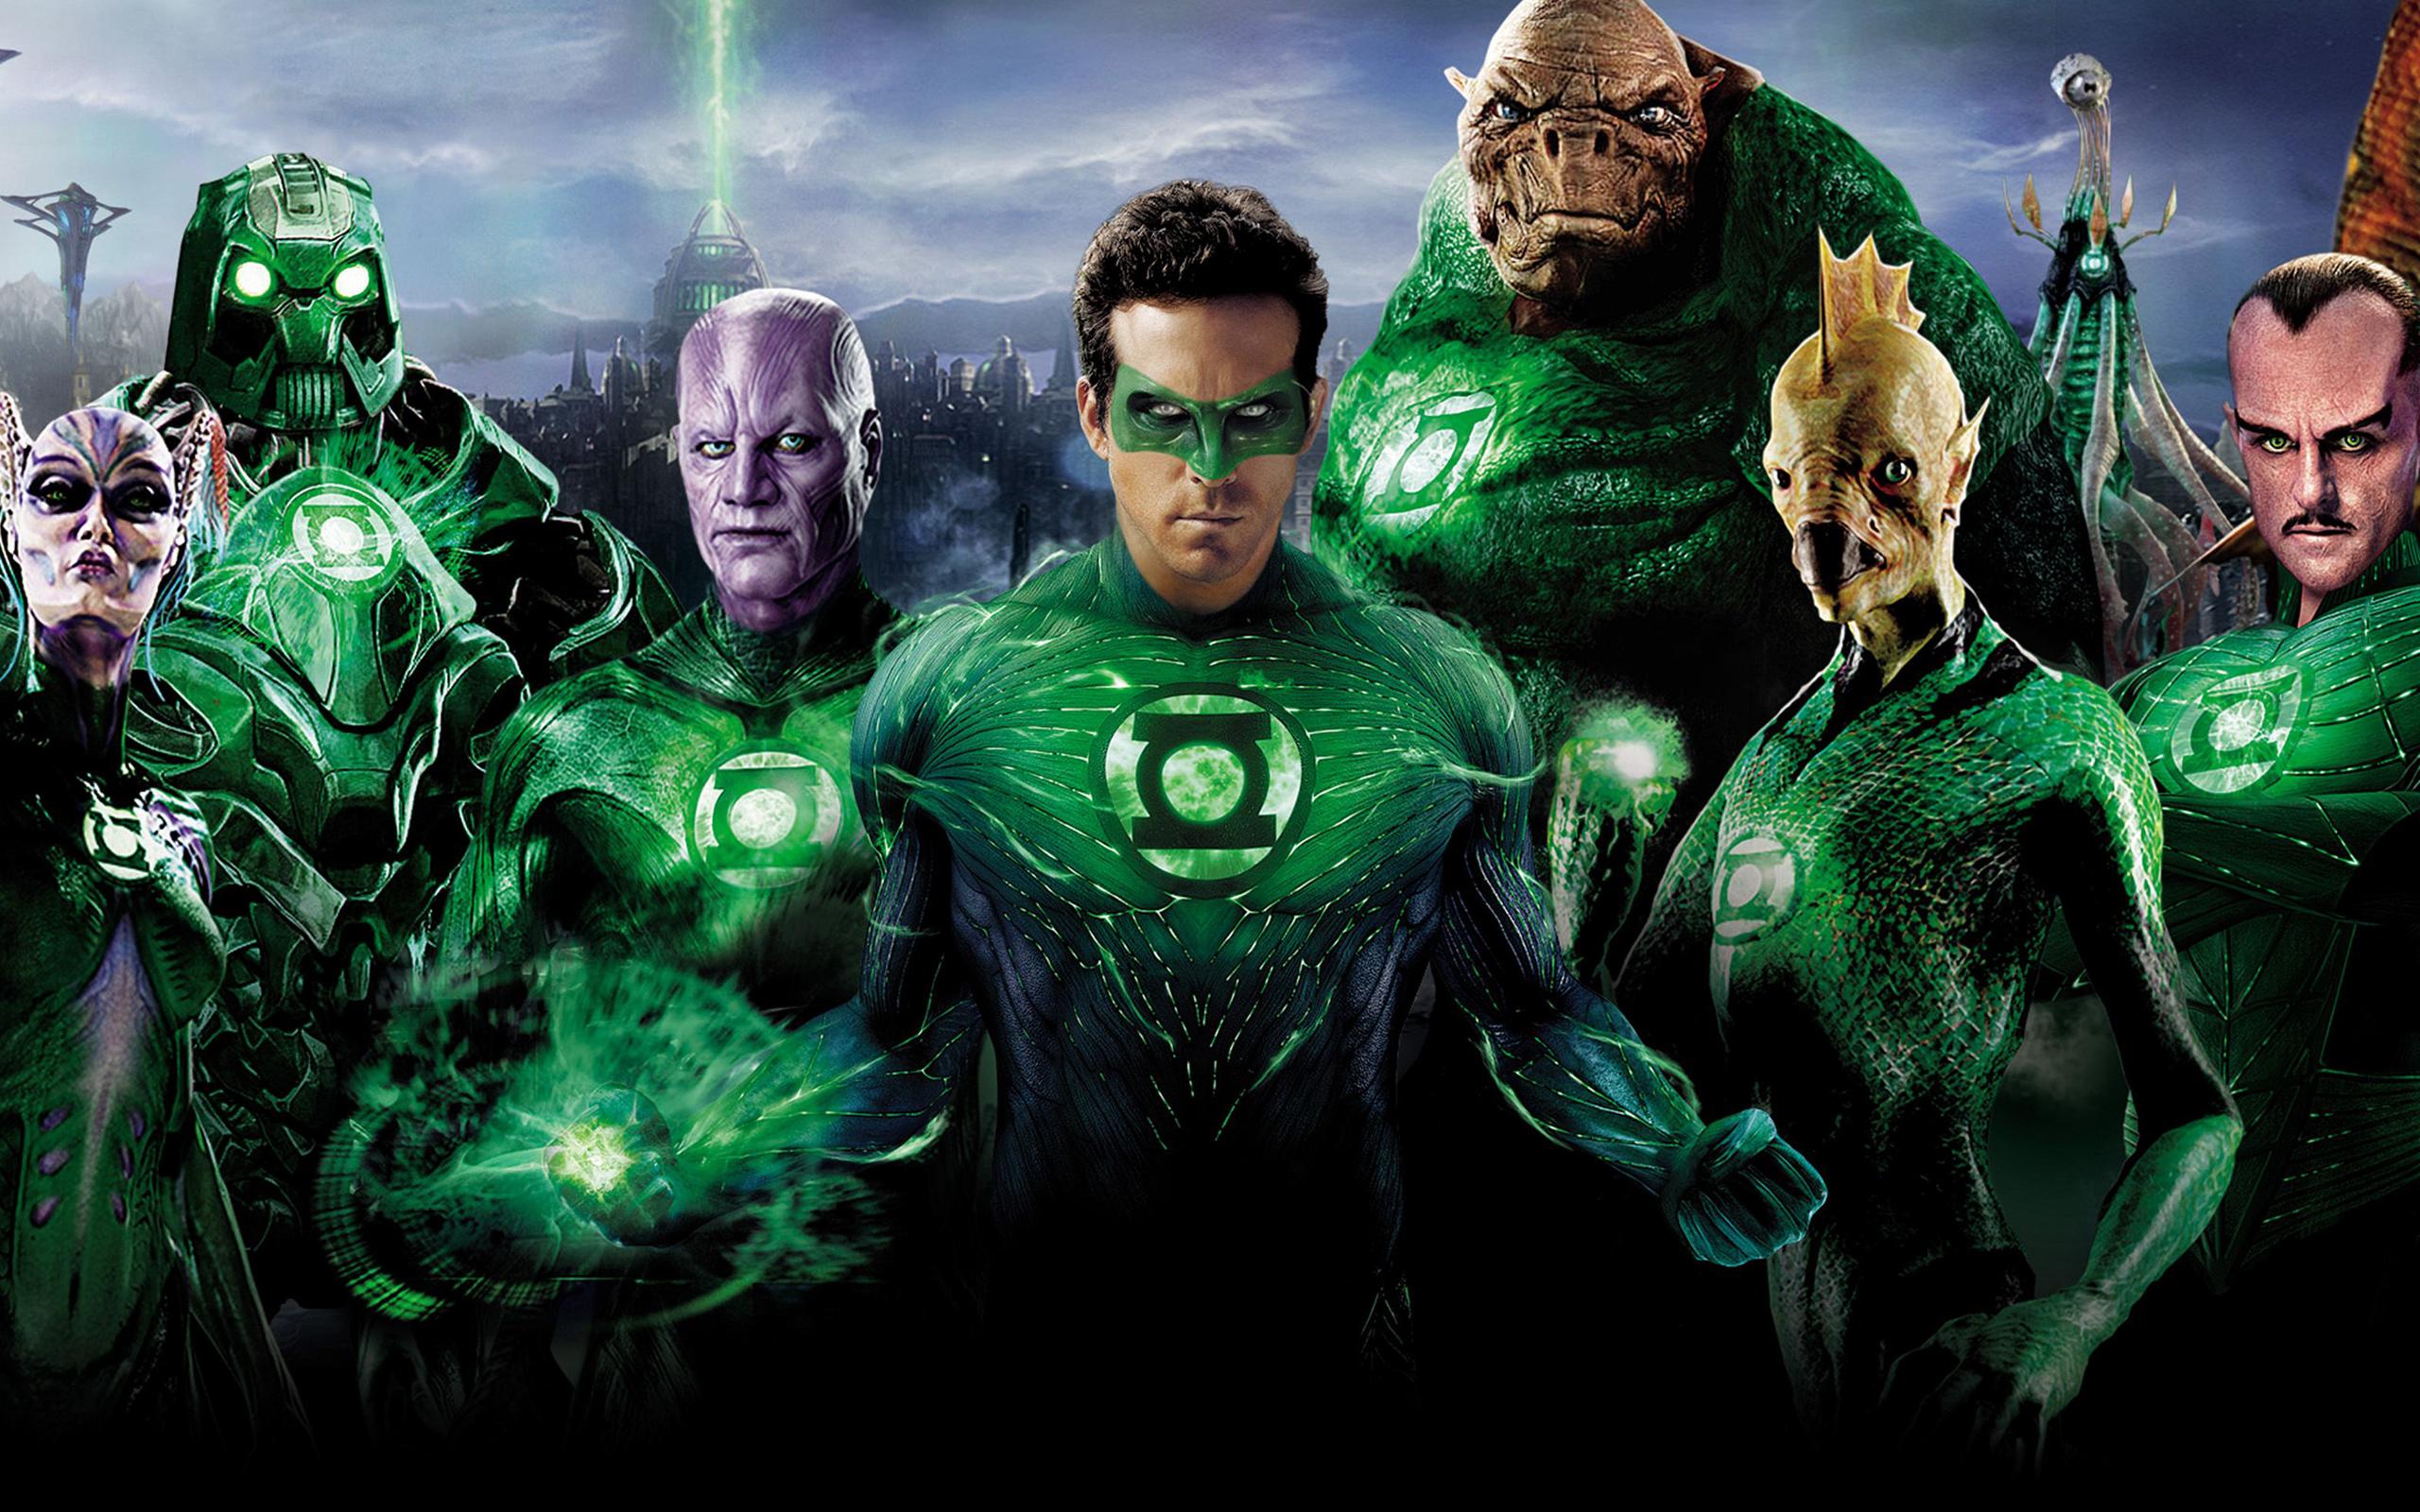 Green Lantern Superheroes 4180074 2560x1600 All For Desktop 2560x1600